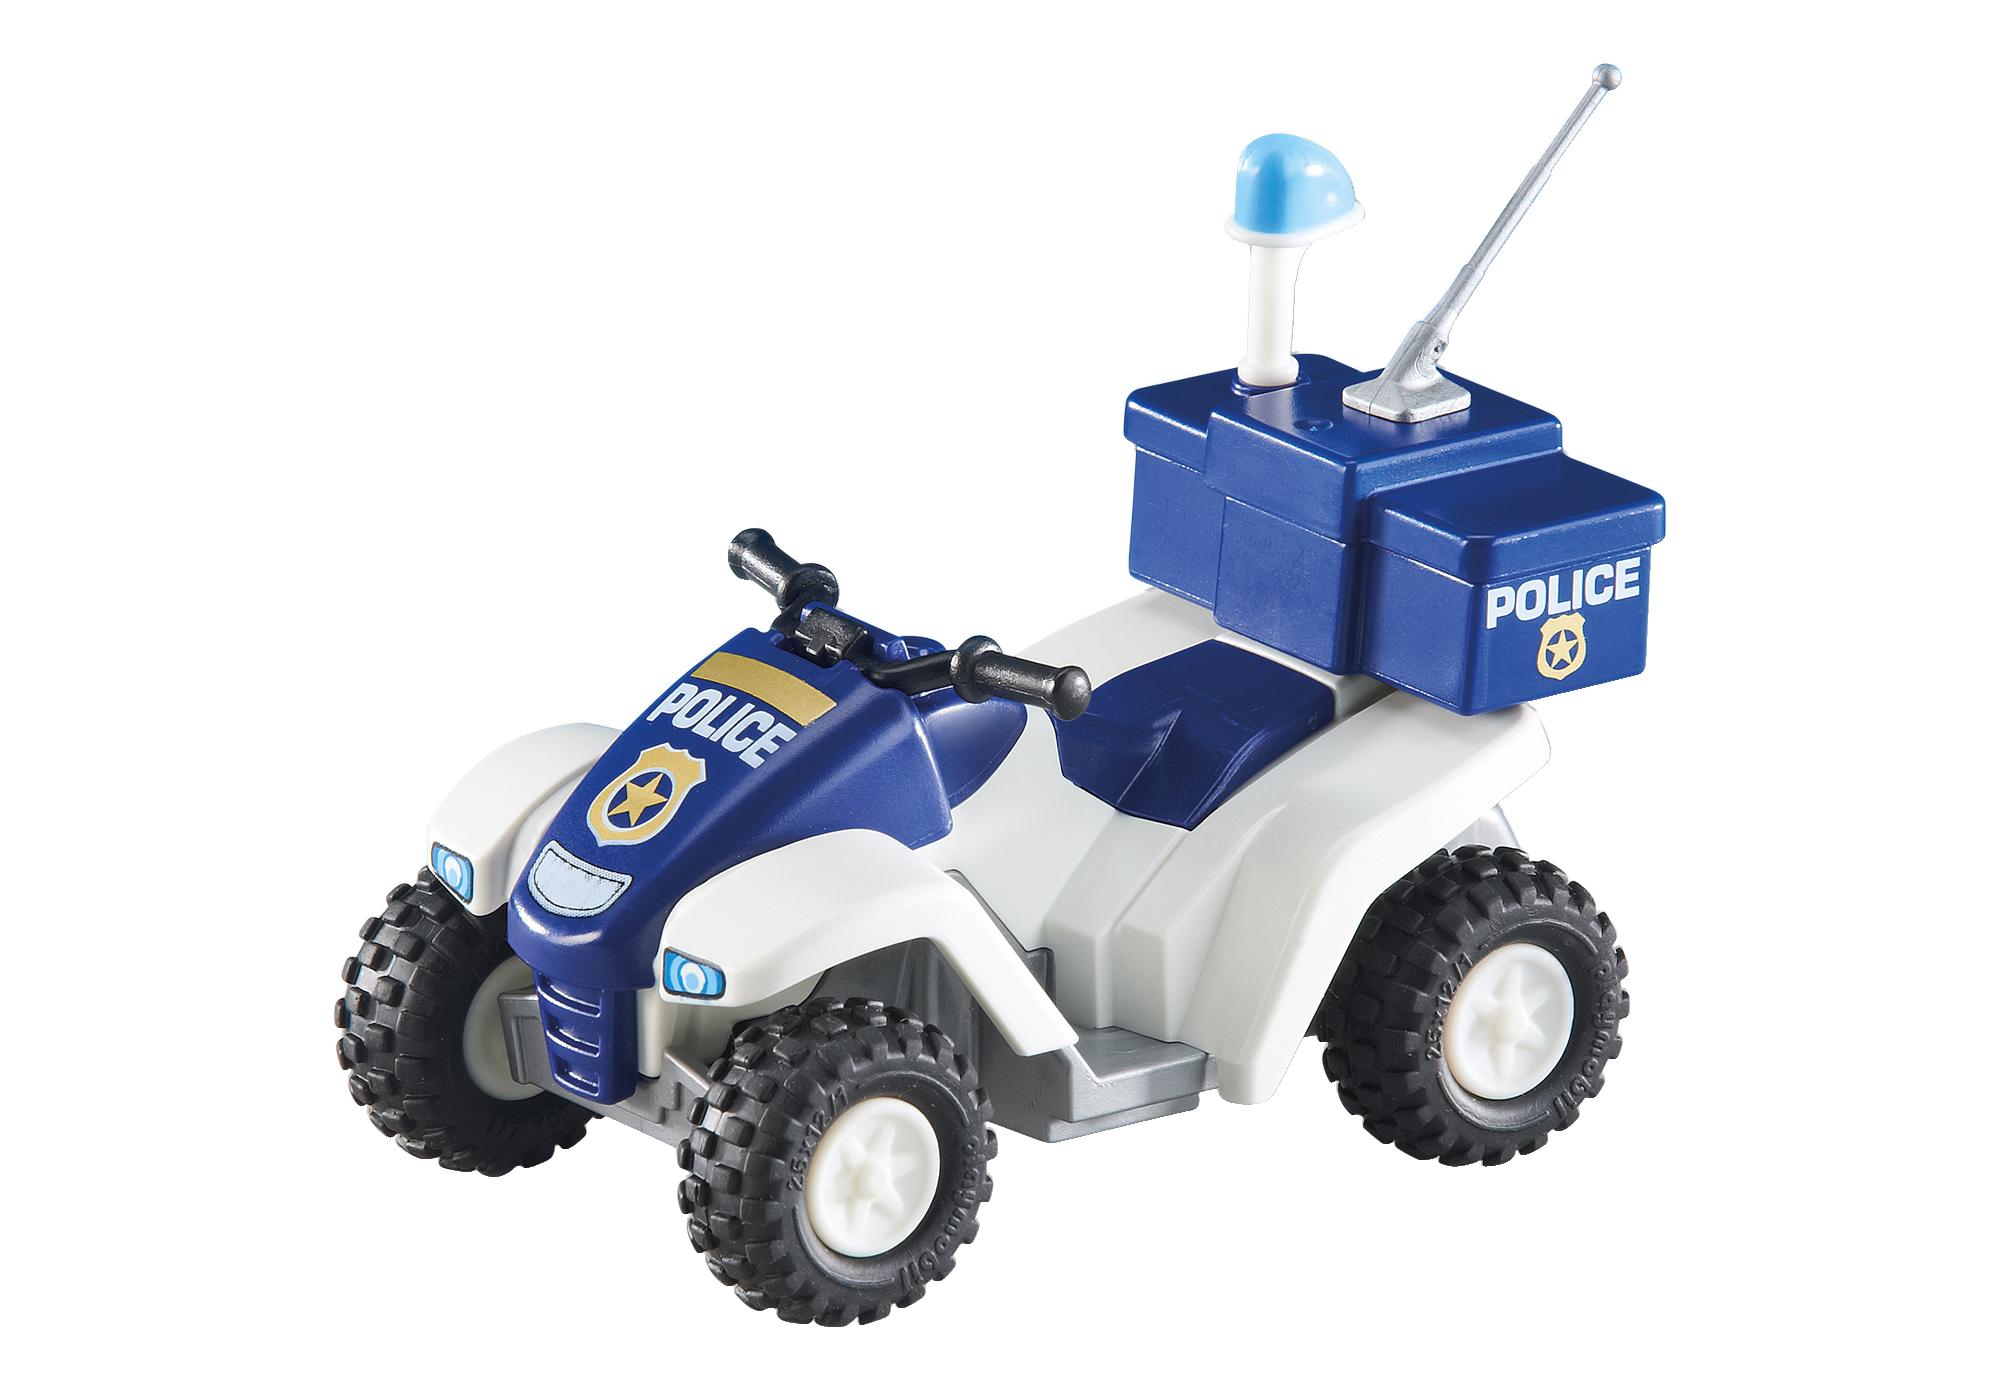 http://media.playmobil.com/i/playmobil/6504_product_box_front/Quad policji